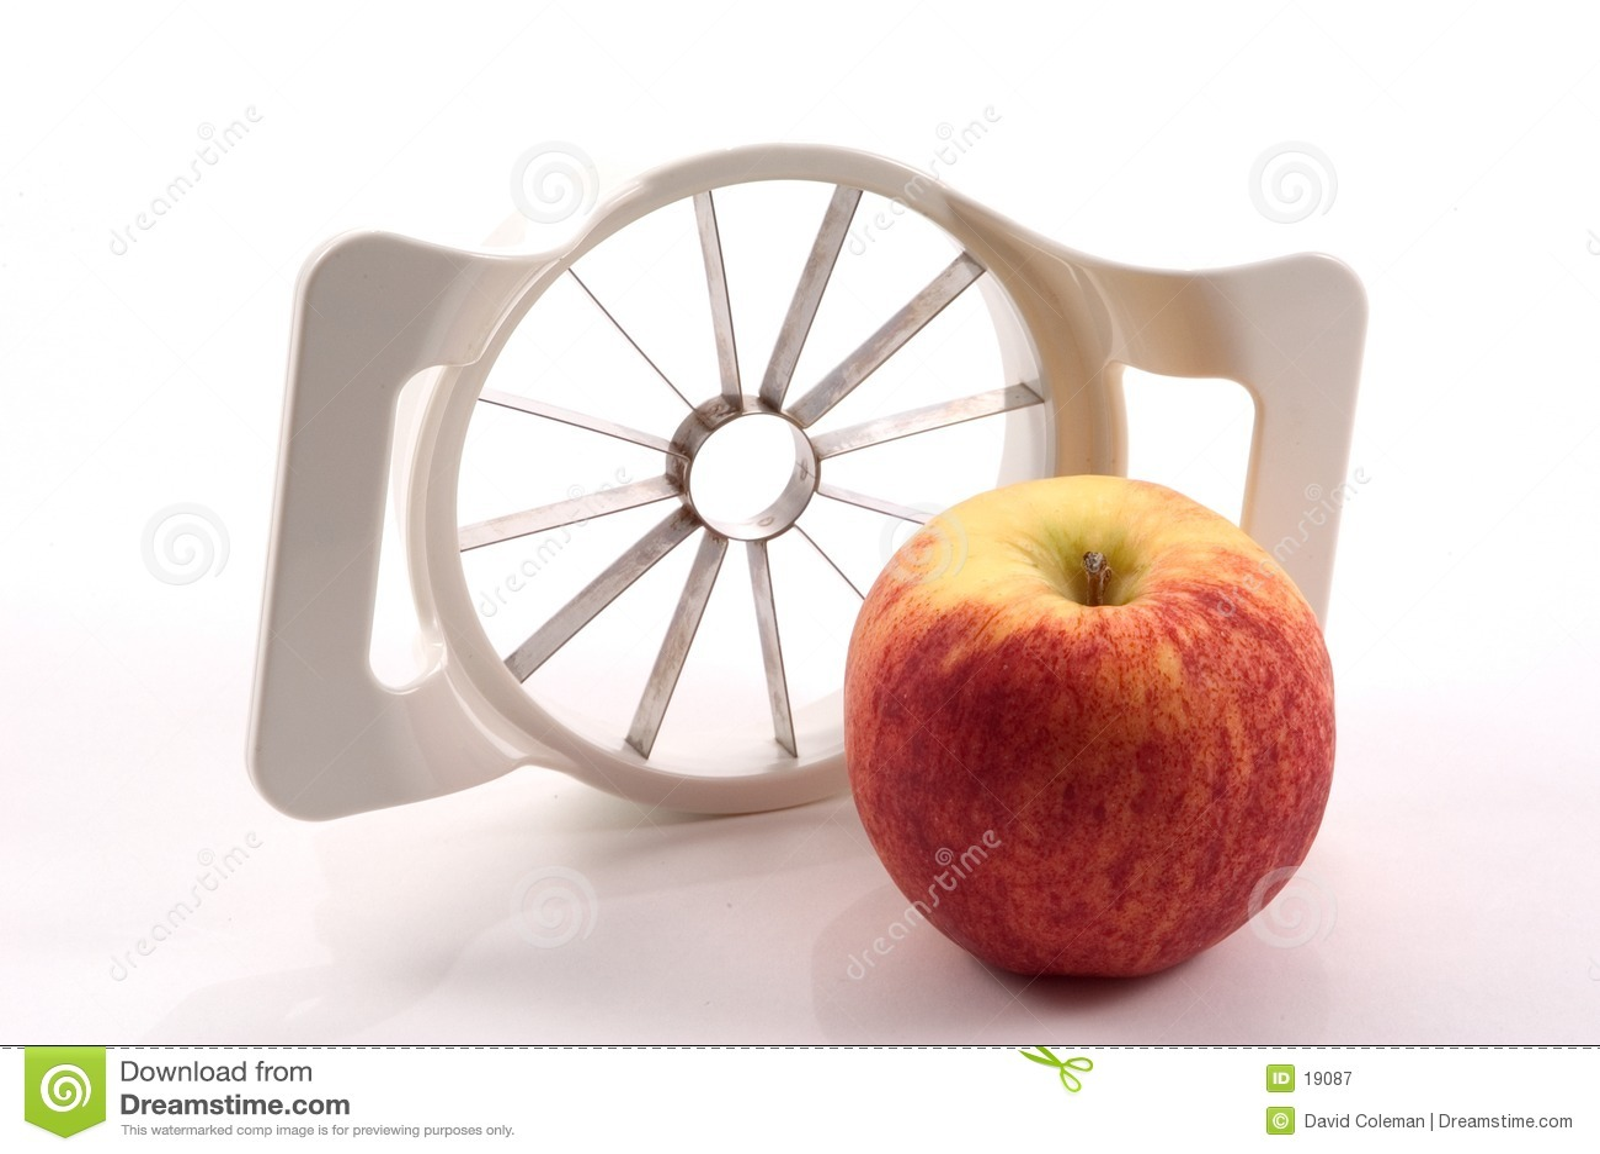 Apple and Apple Slicer